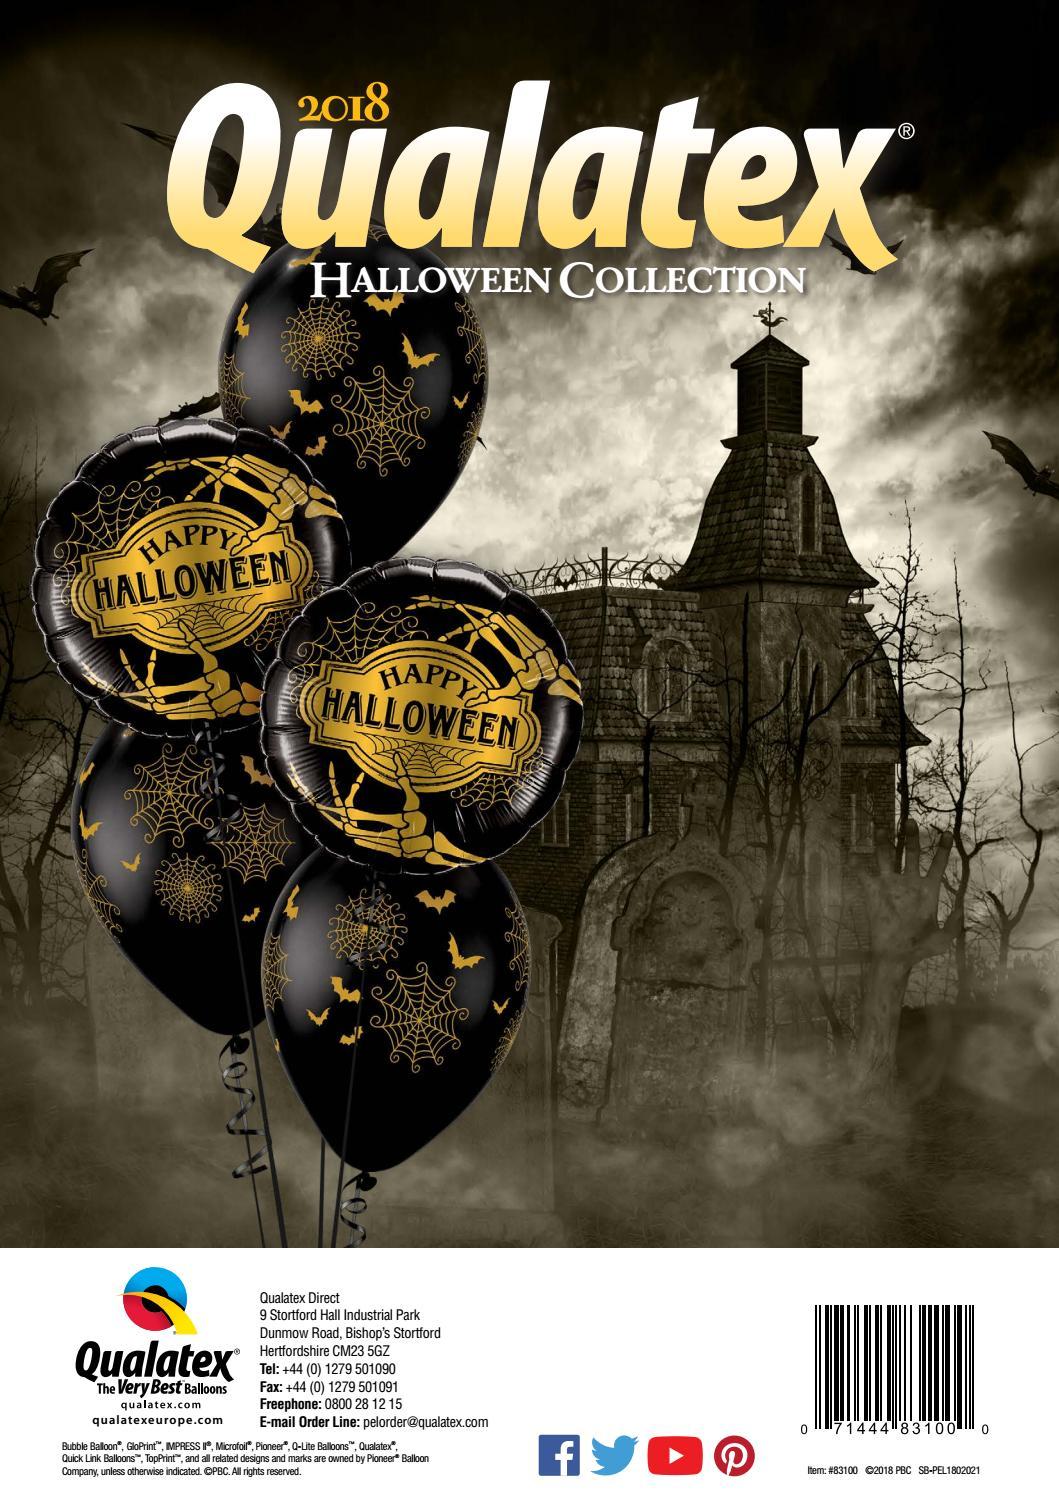 2018 pel halloween and christmas collectionpioneer balloon